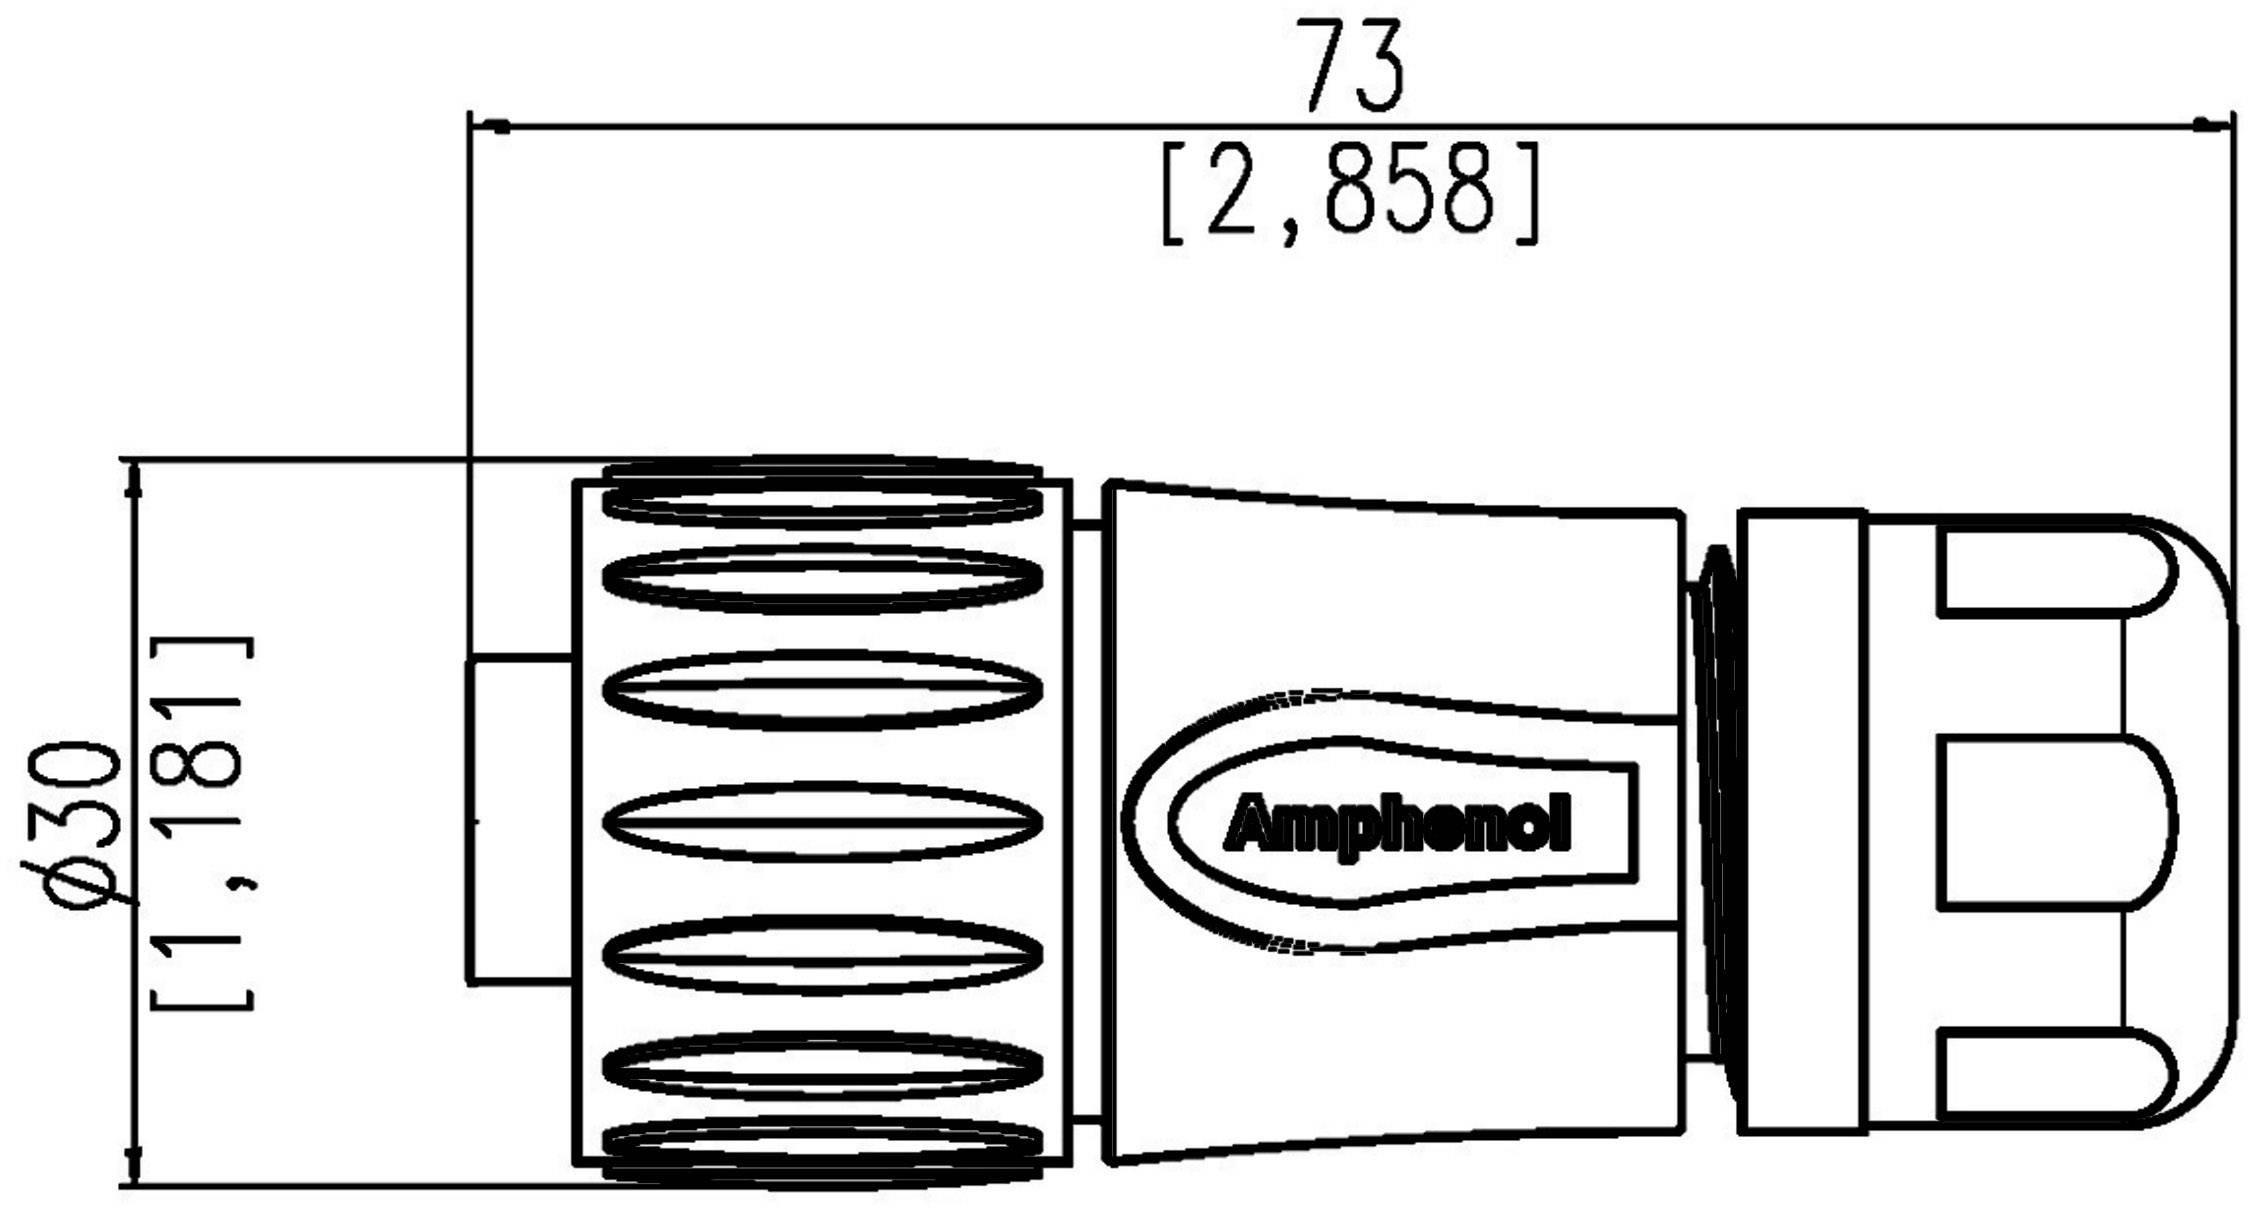 Amphenol C016 20H003 110 12 IP67 (v zablokovanom stave), polyamid 6.6, pólů + PE, 1 ks